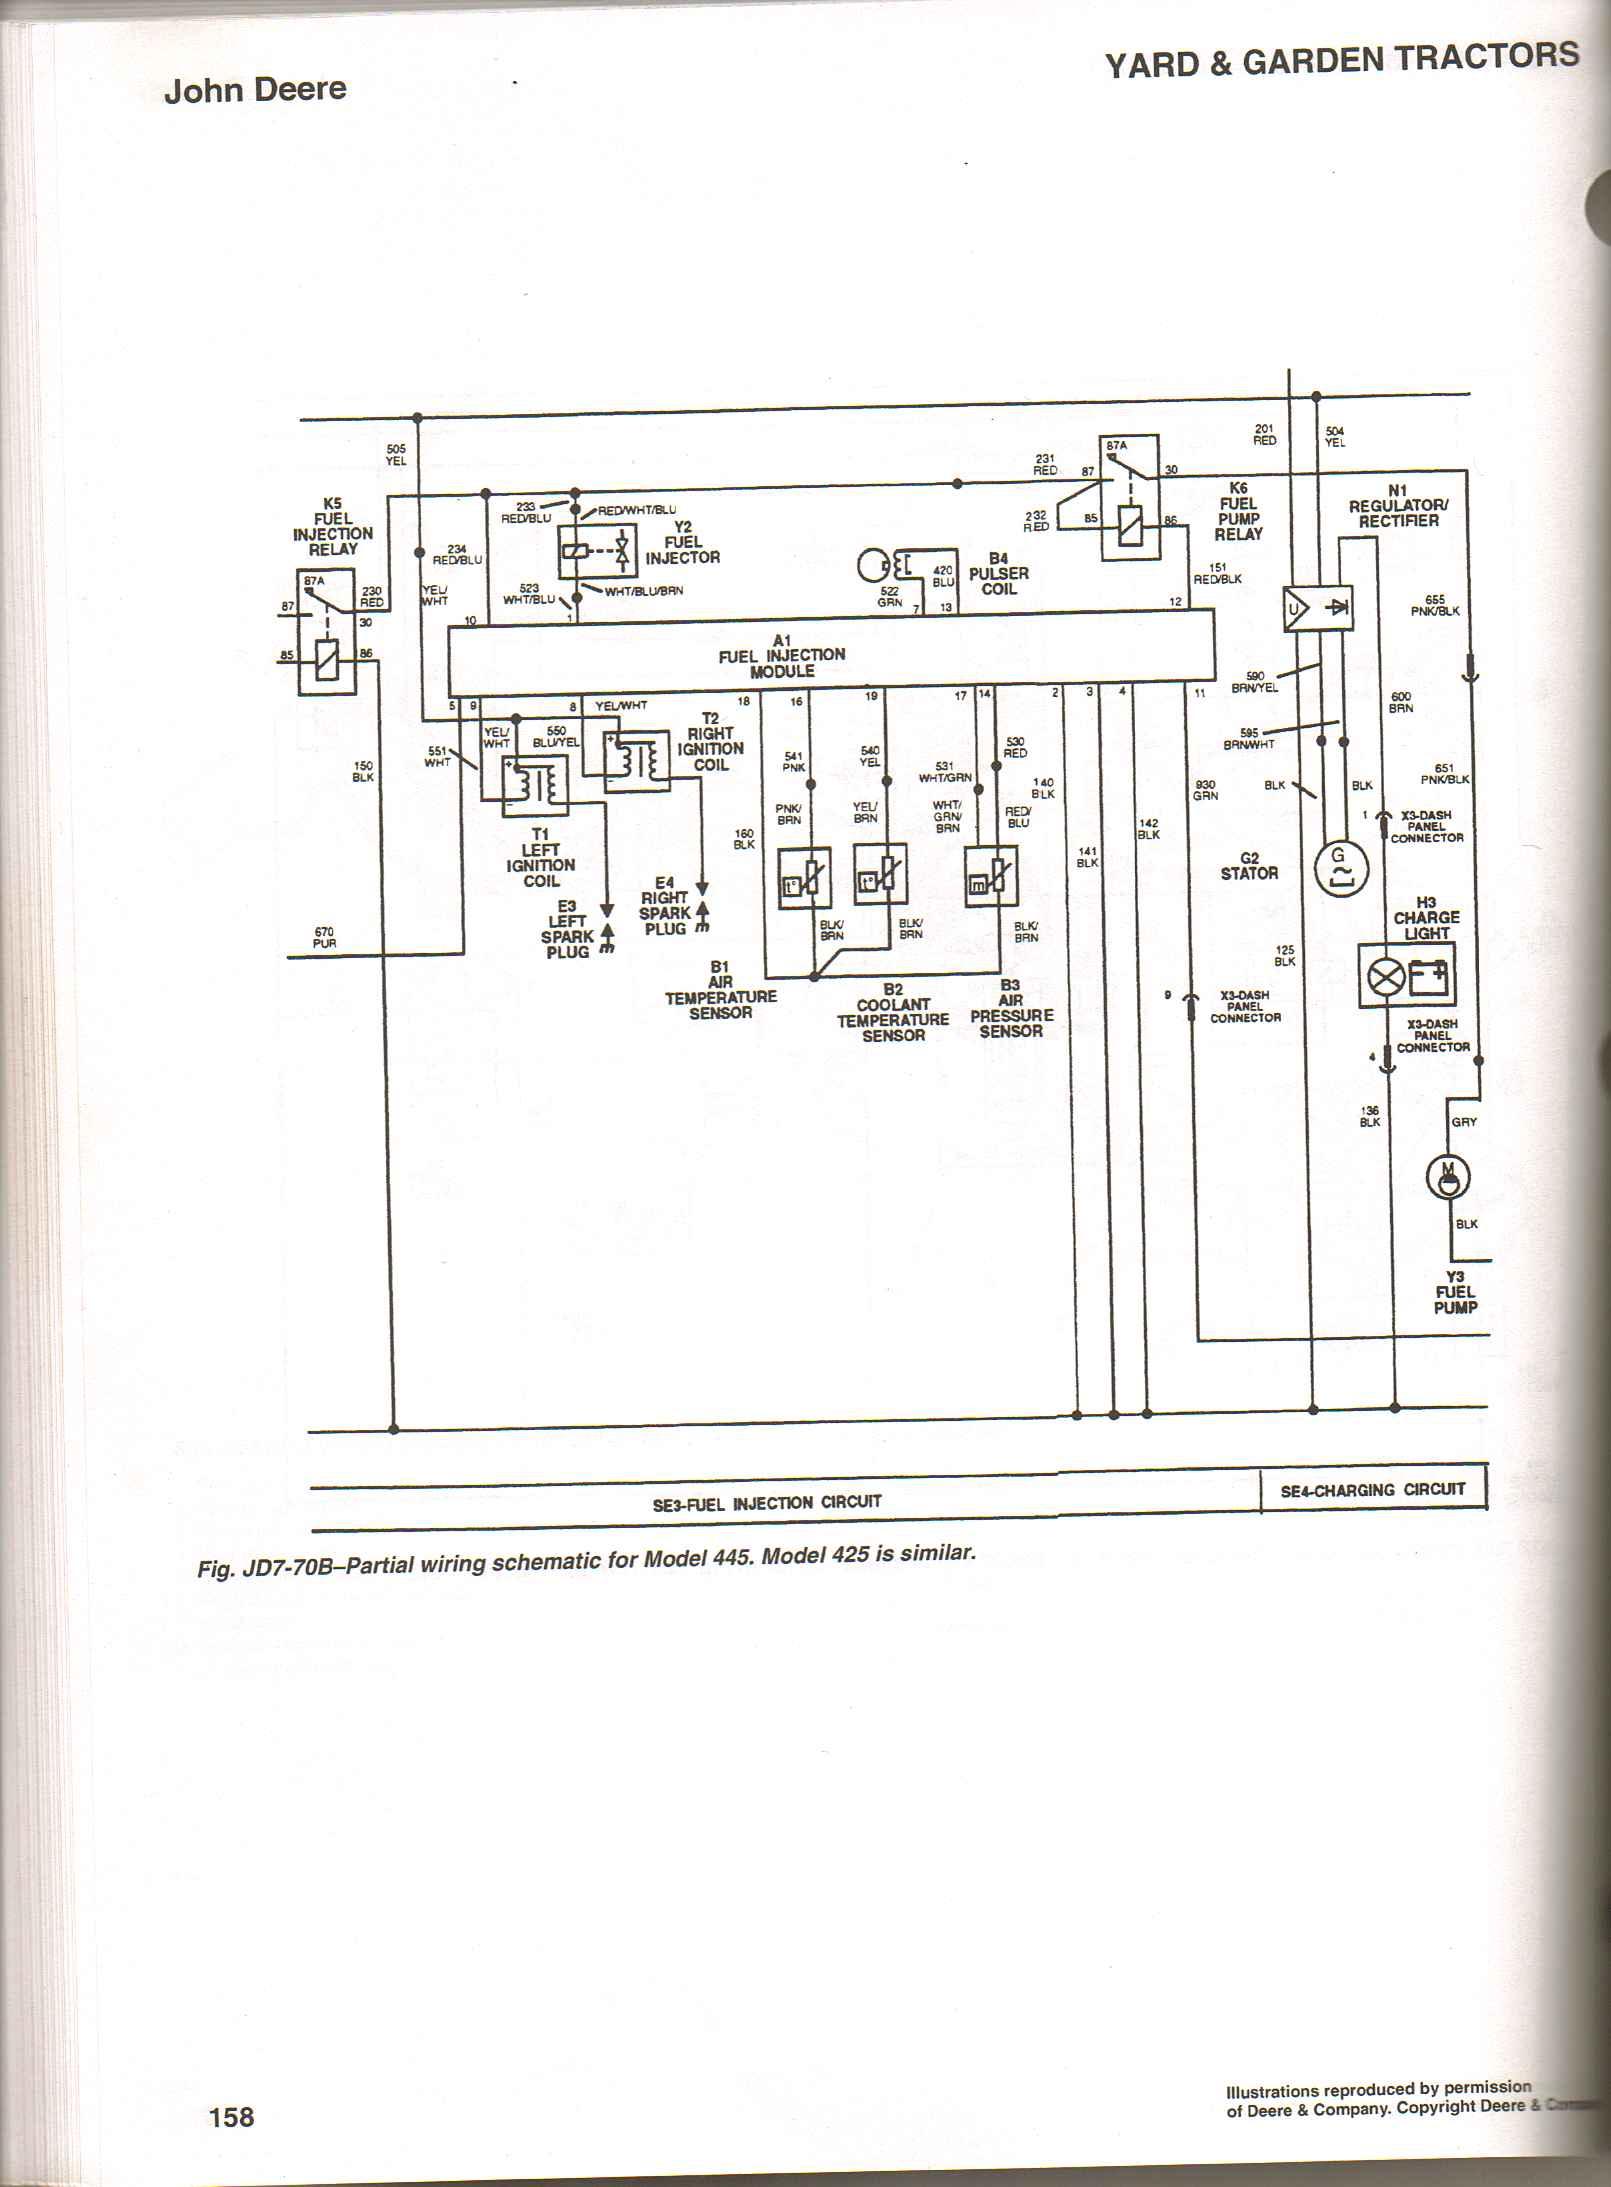 ce9f970f-c614-47be-95e5-afdb3b1de87f_Deere 425 4453.jpg